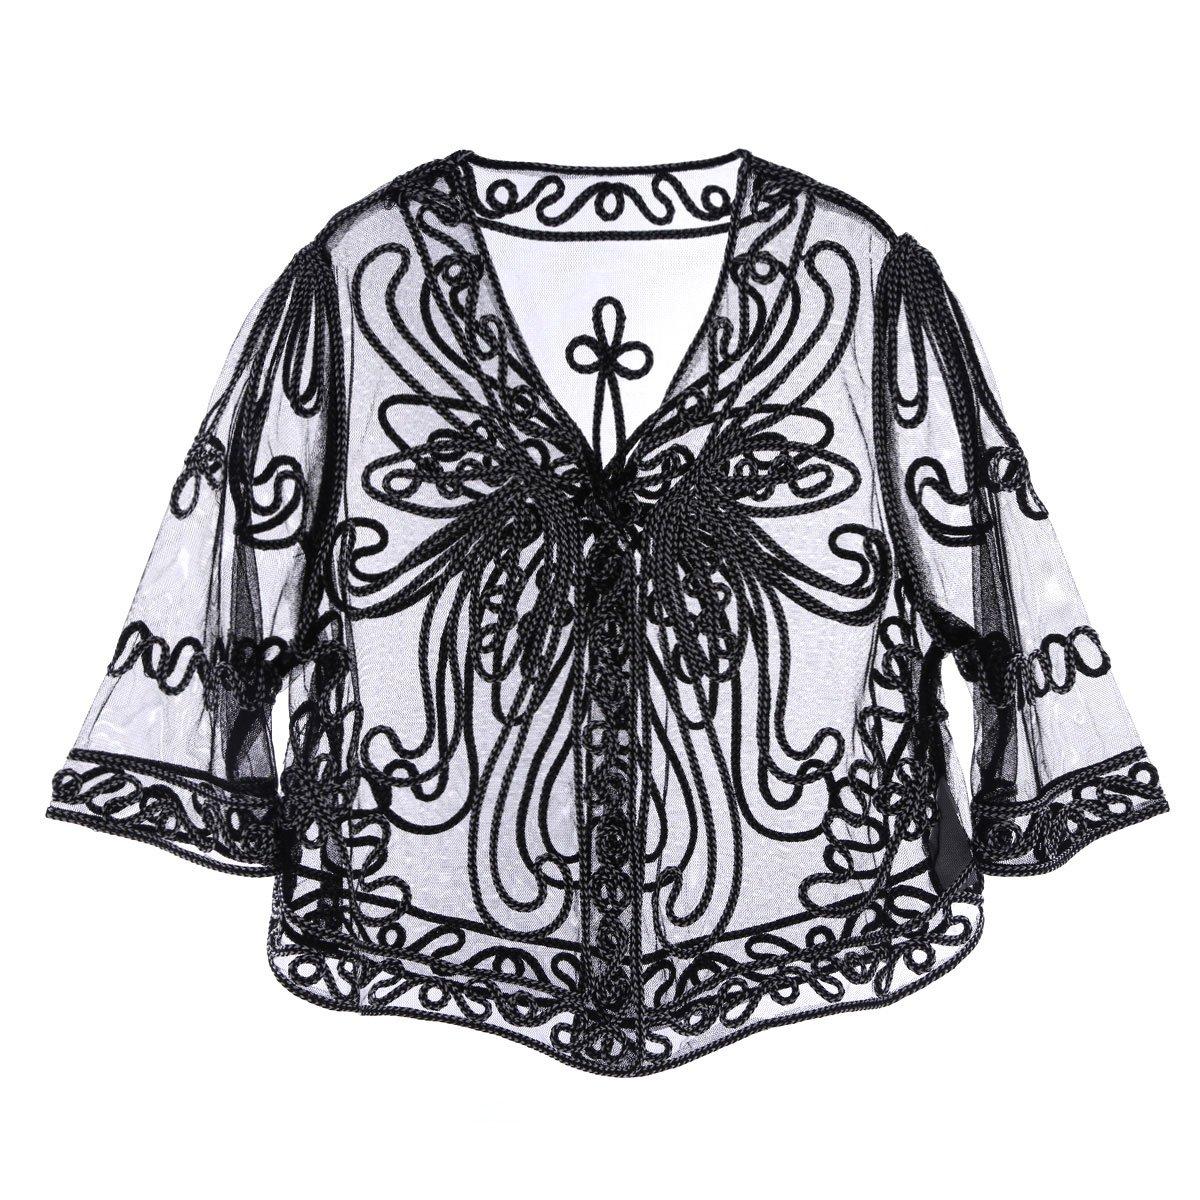 iiniim Women's Casual Lace Crochet Cardigan 3 4 Sleeve Sheer Cover Up Jacket Plus Size Black&White One Size